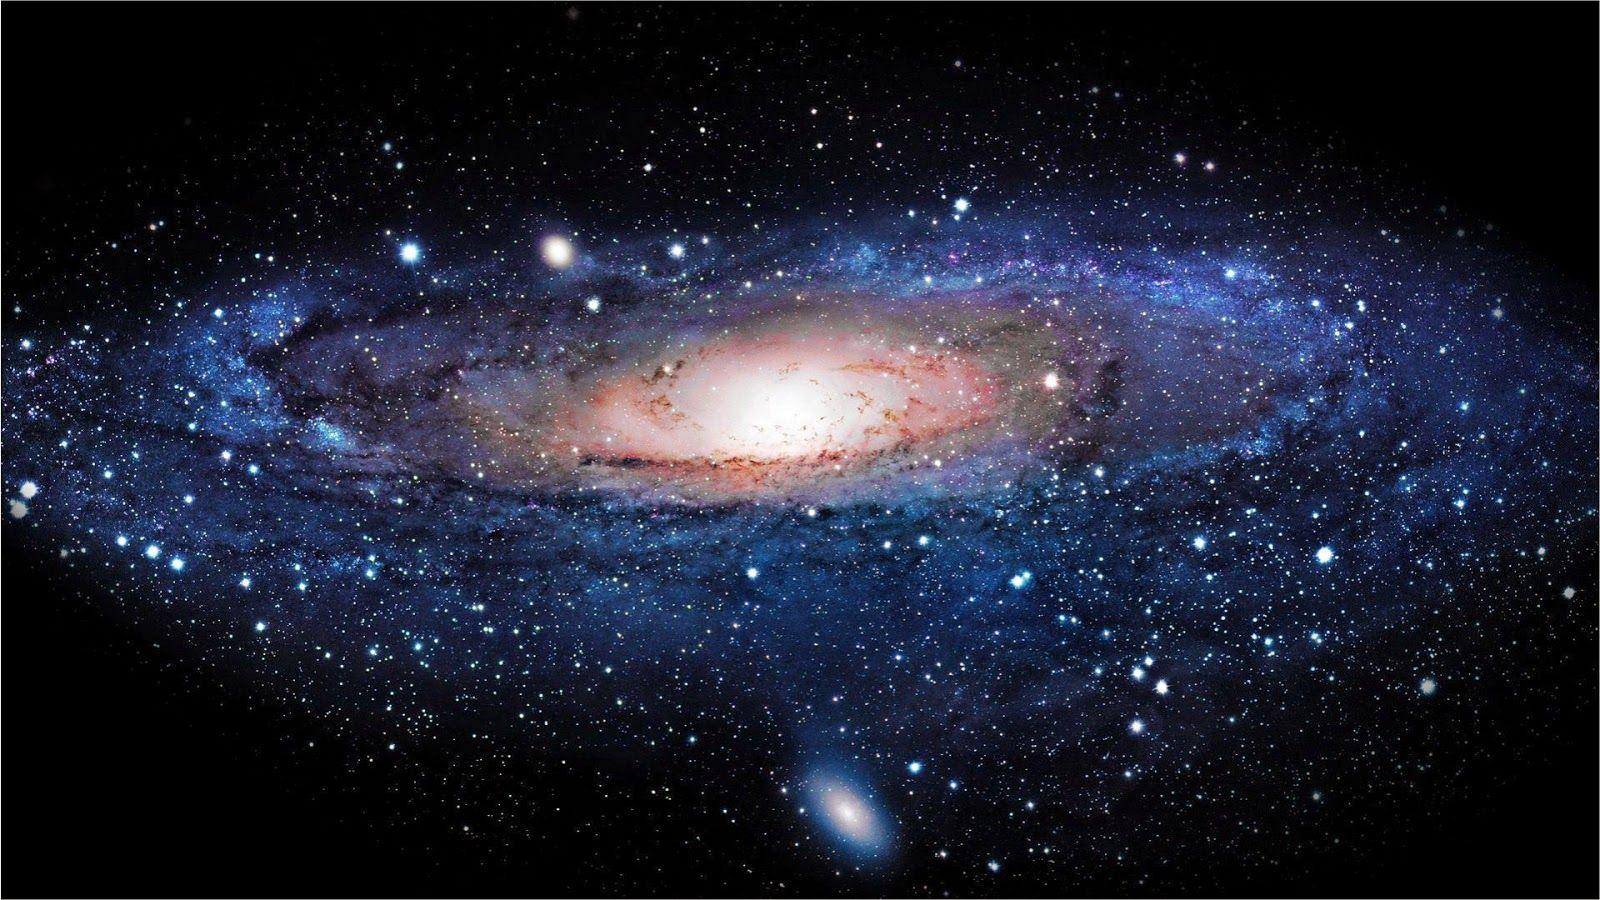 WALLPAPER ANDROID IPHONE 10 Wallpaper Nebula 1920x1080